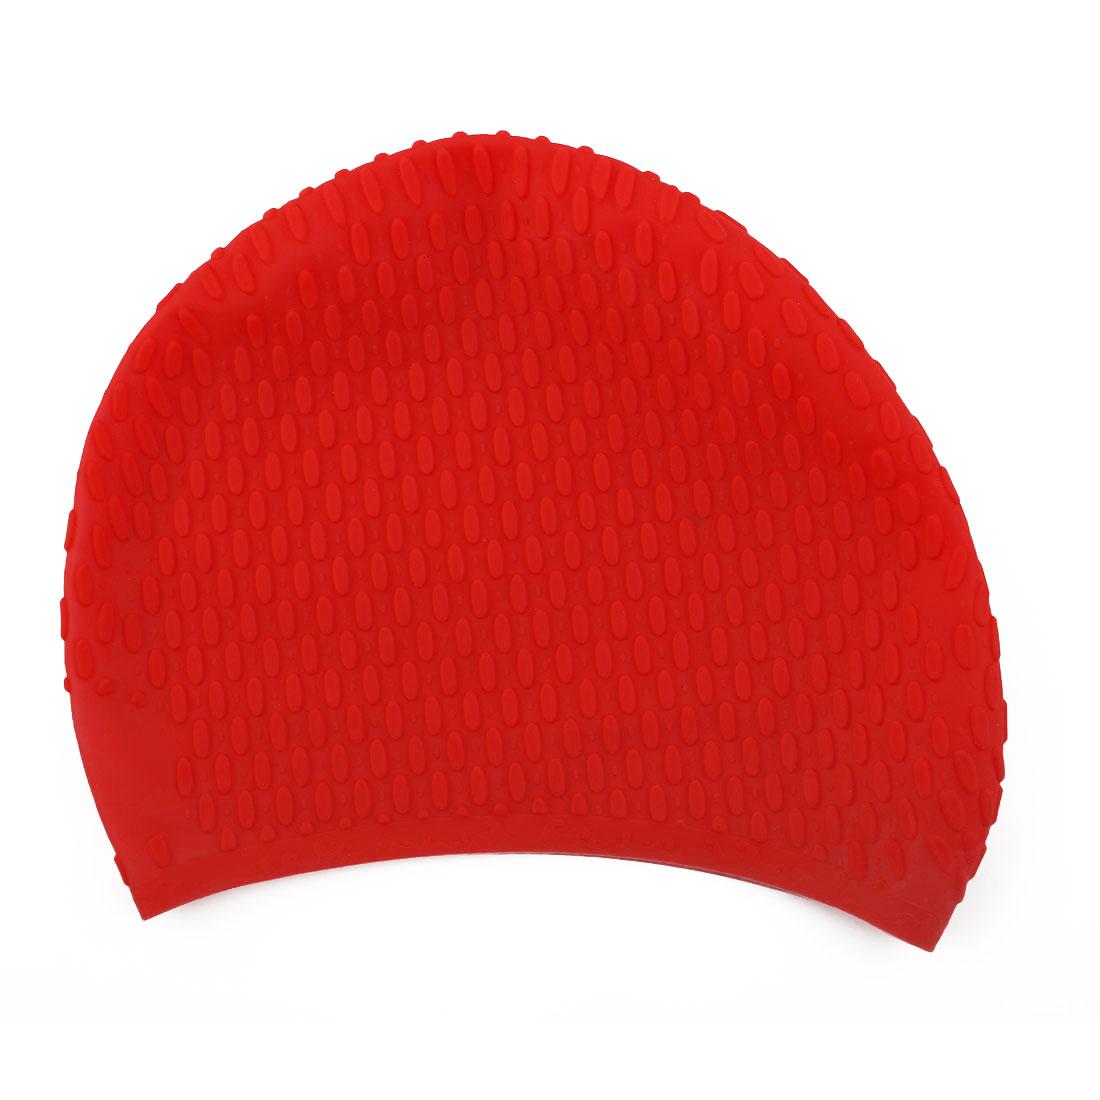 Adult Unisex Silicone Dome Shape Anti-slip Elastic Swimming Cap Underwater Bathing Hat Red